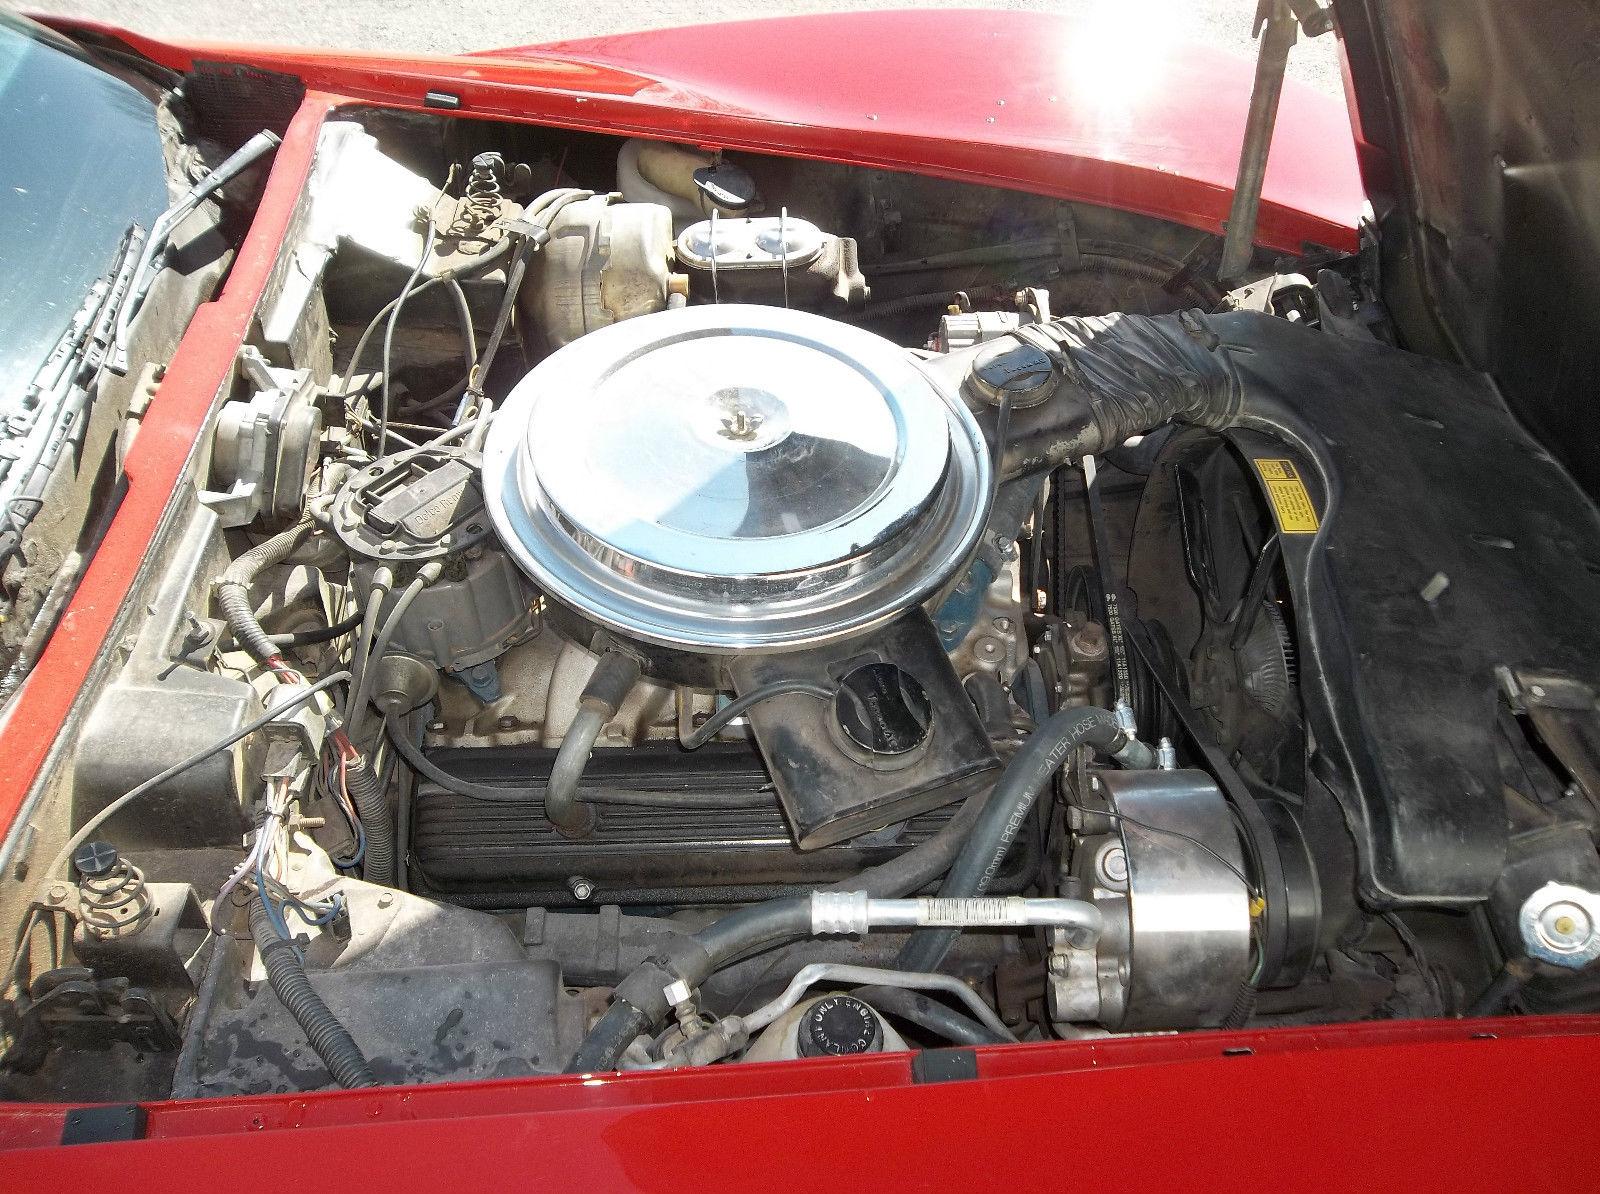 Worksheet. 1979 Chevrolet Corvette L82 Red with Black interior TTops